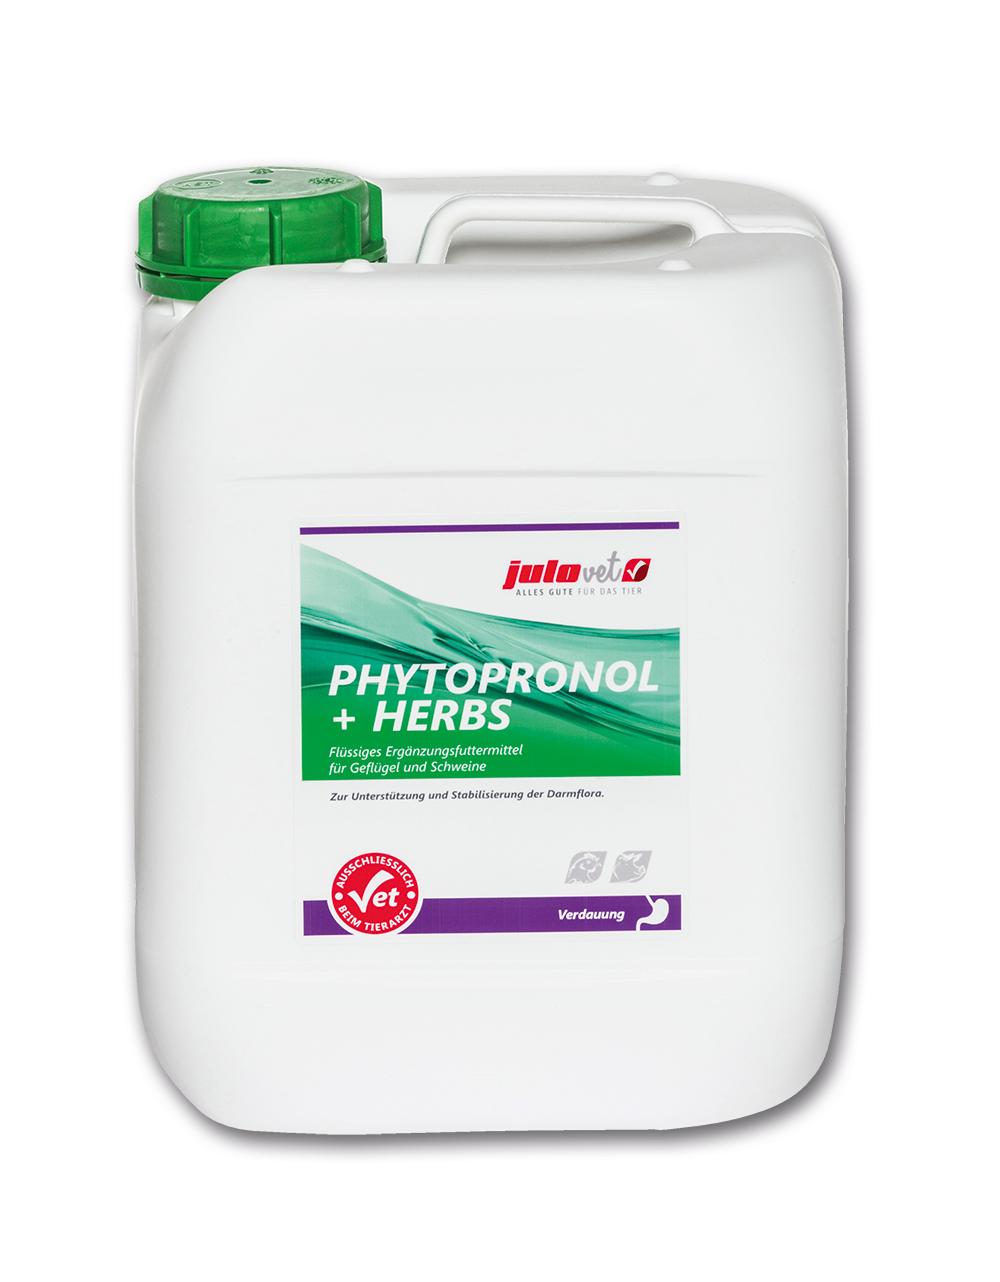 Phytopronol + Herbs